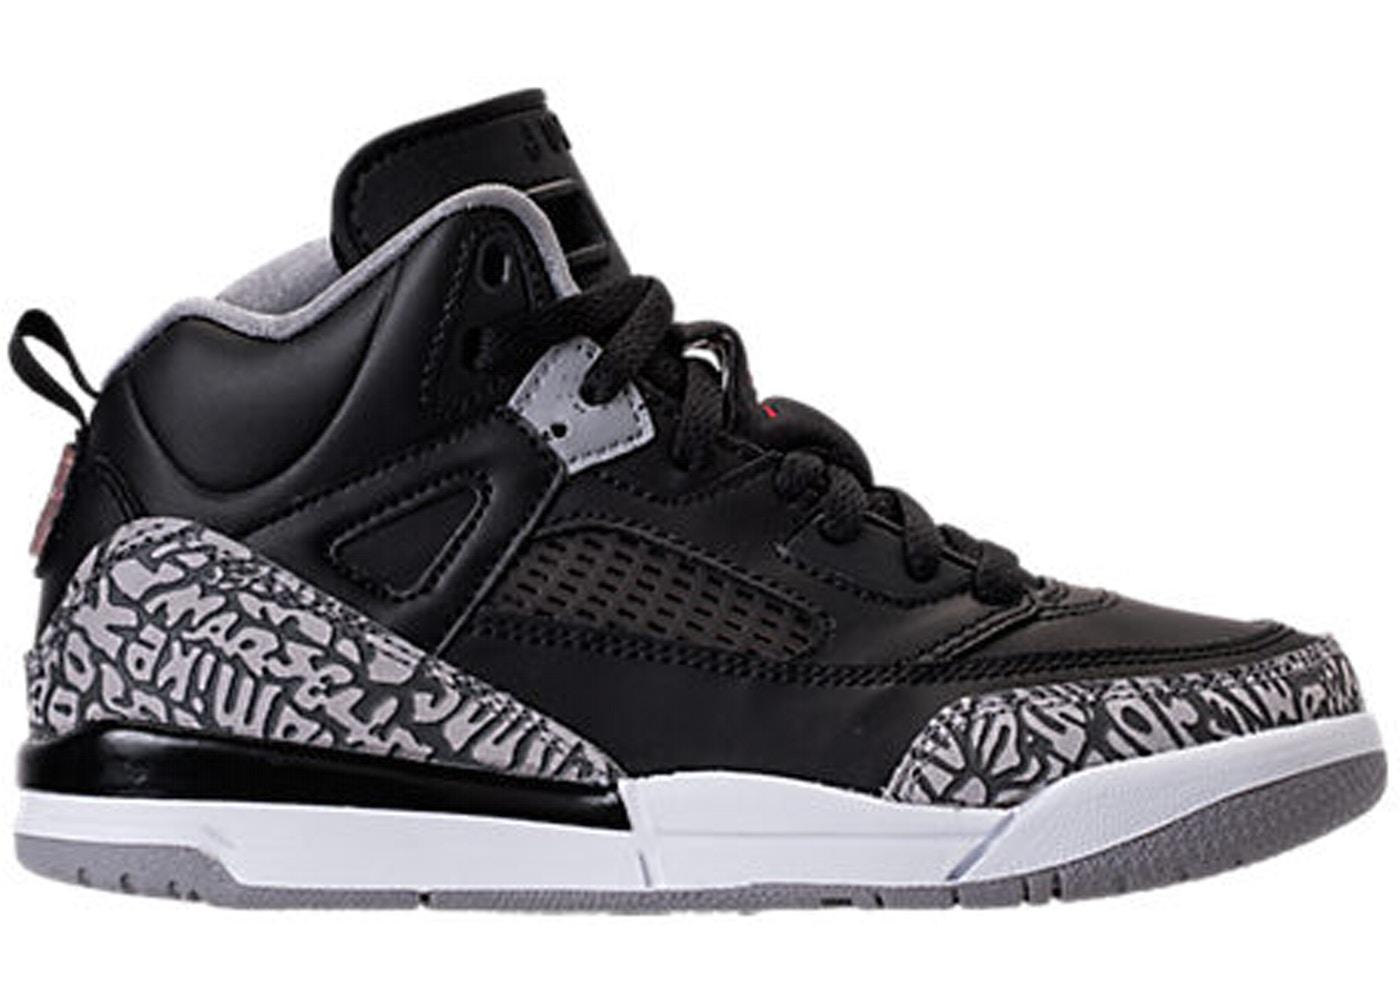 watch 2671c 731a9 Buy Air Jordan Spizike Shoes   Deadstock Sneakers